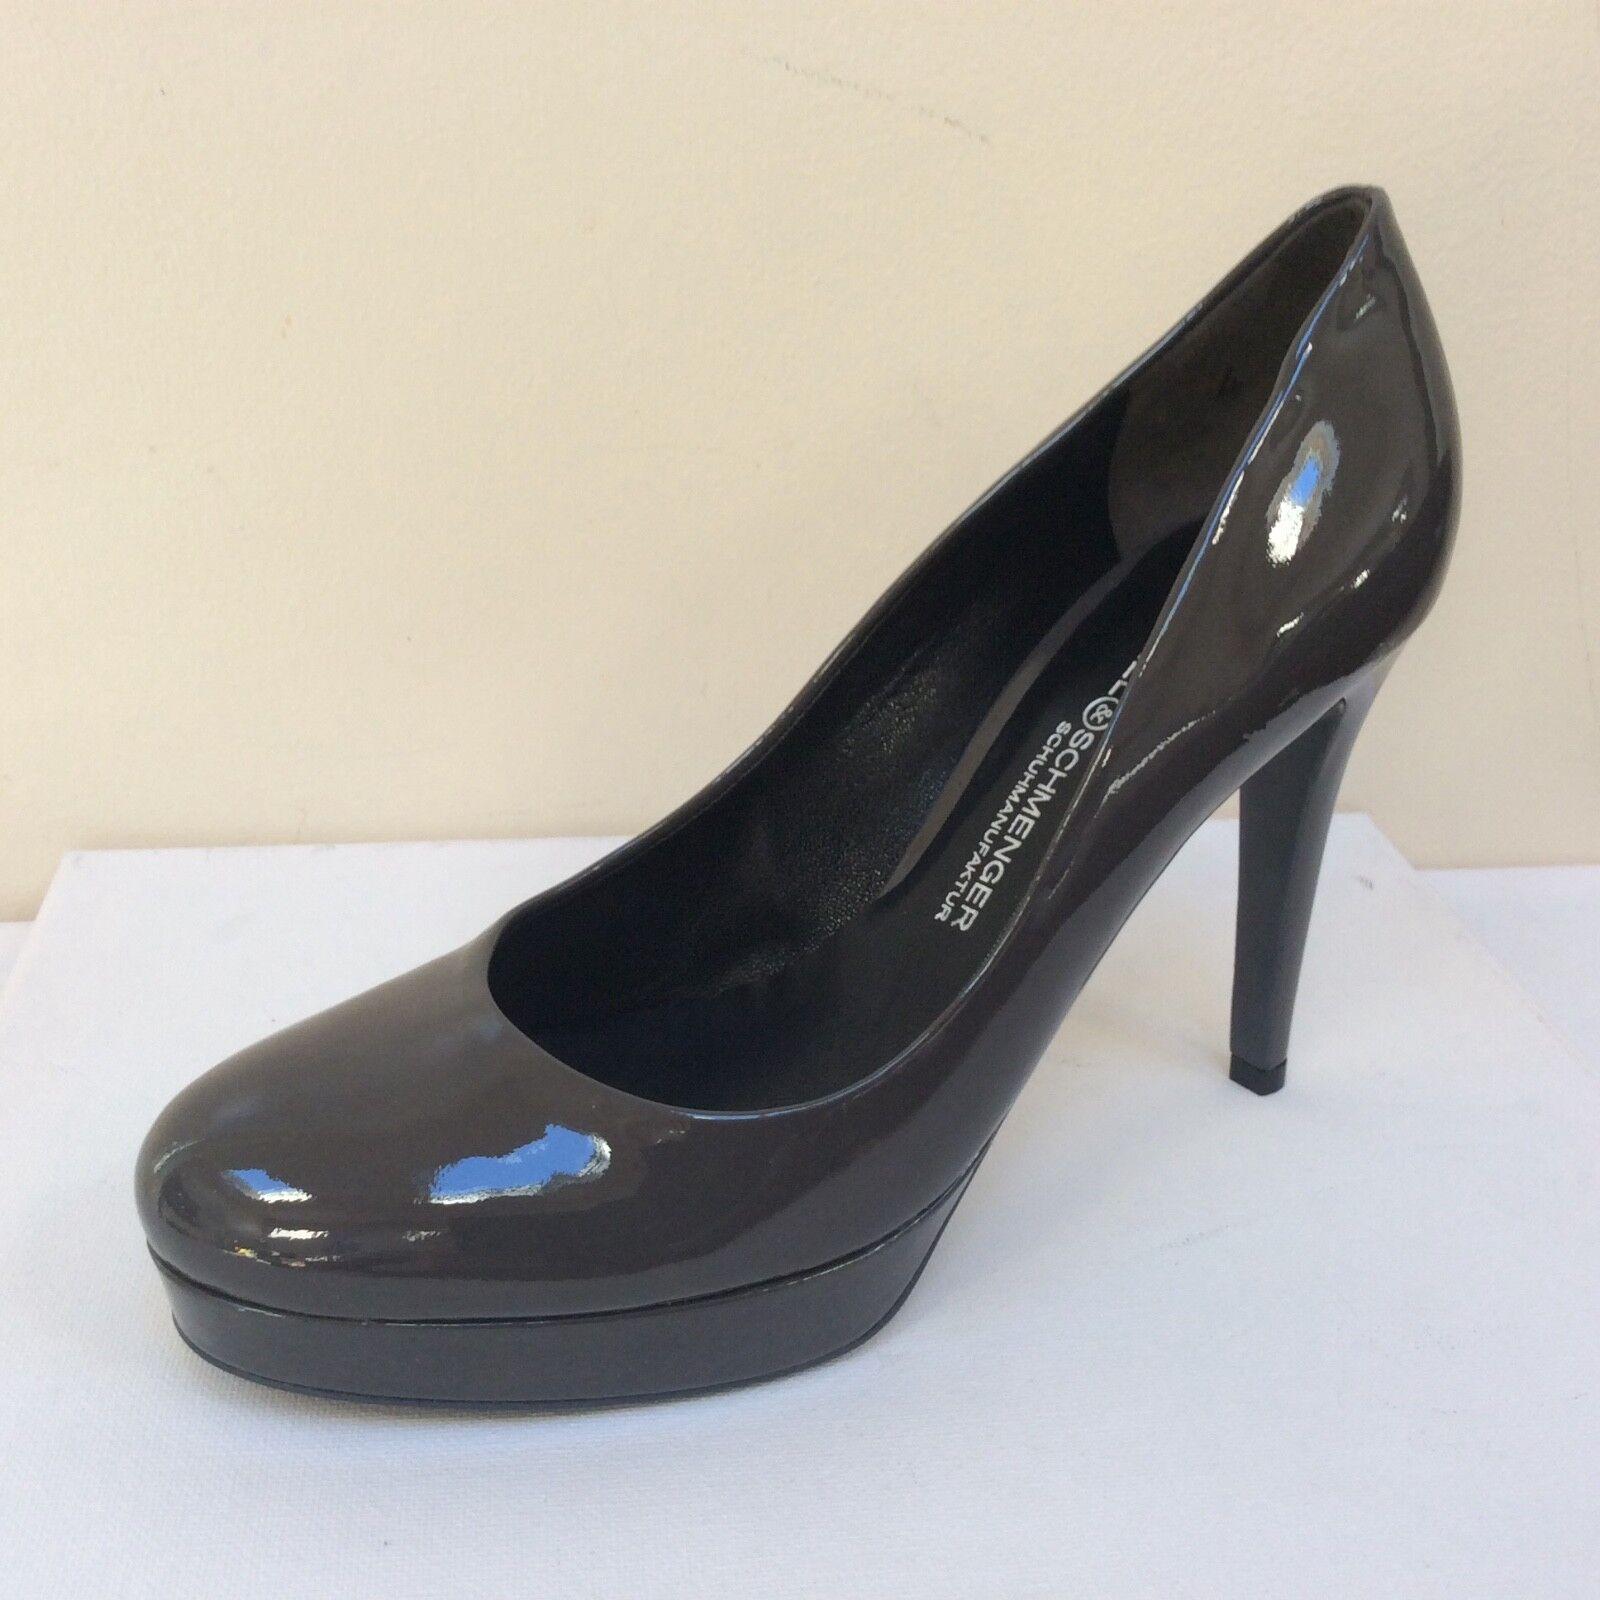 K&S Sheyla dark gris patent platform courts, UK 4 EU 37,   BNWB